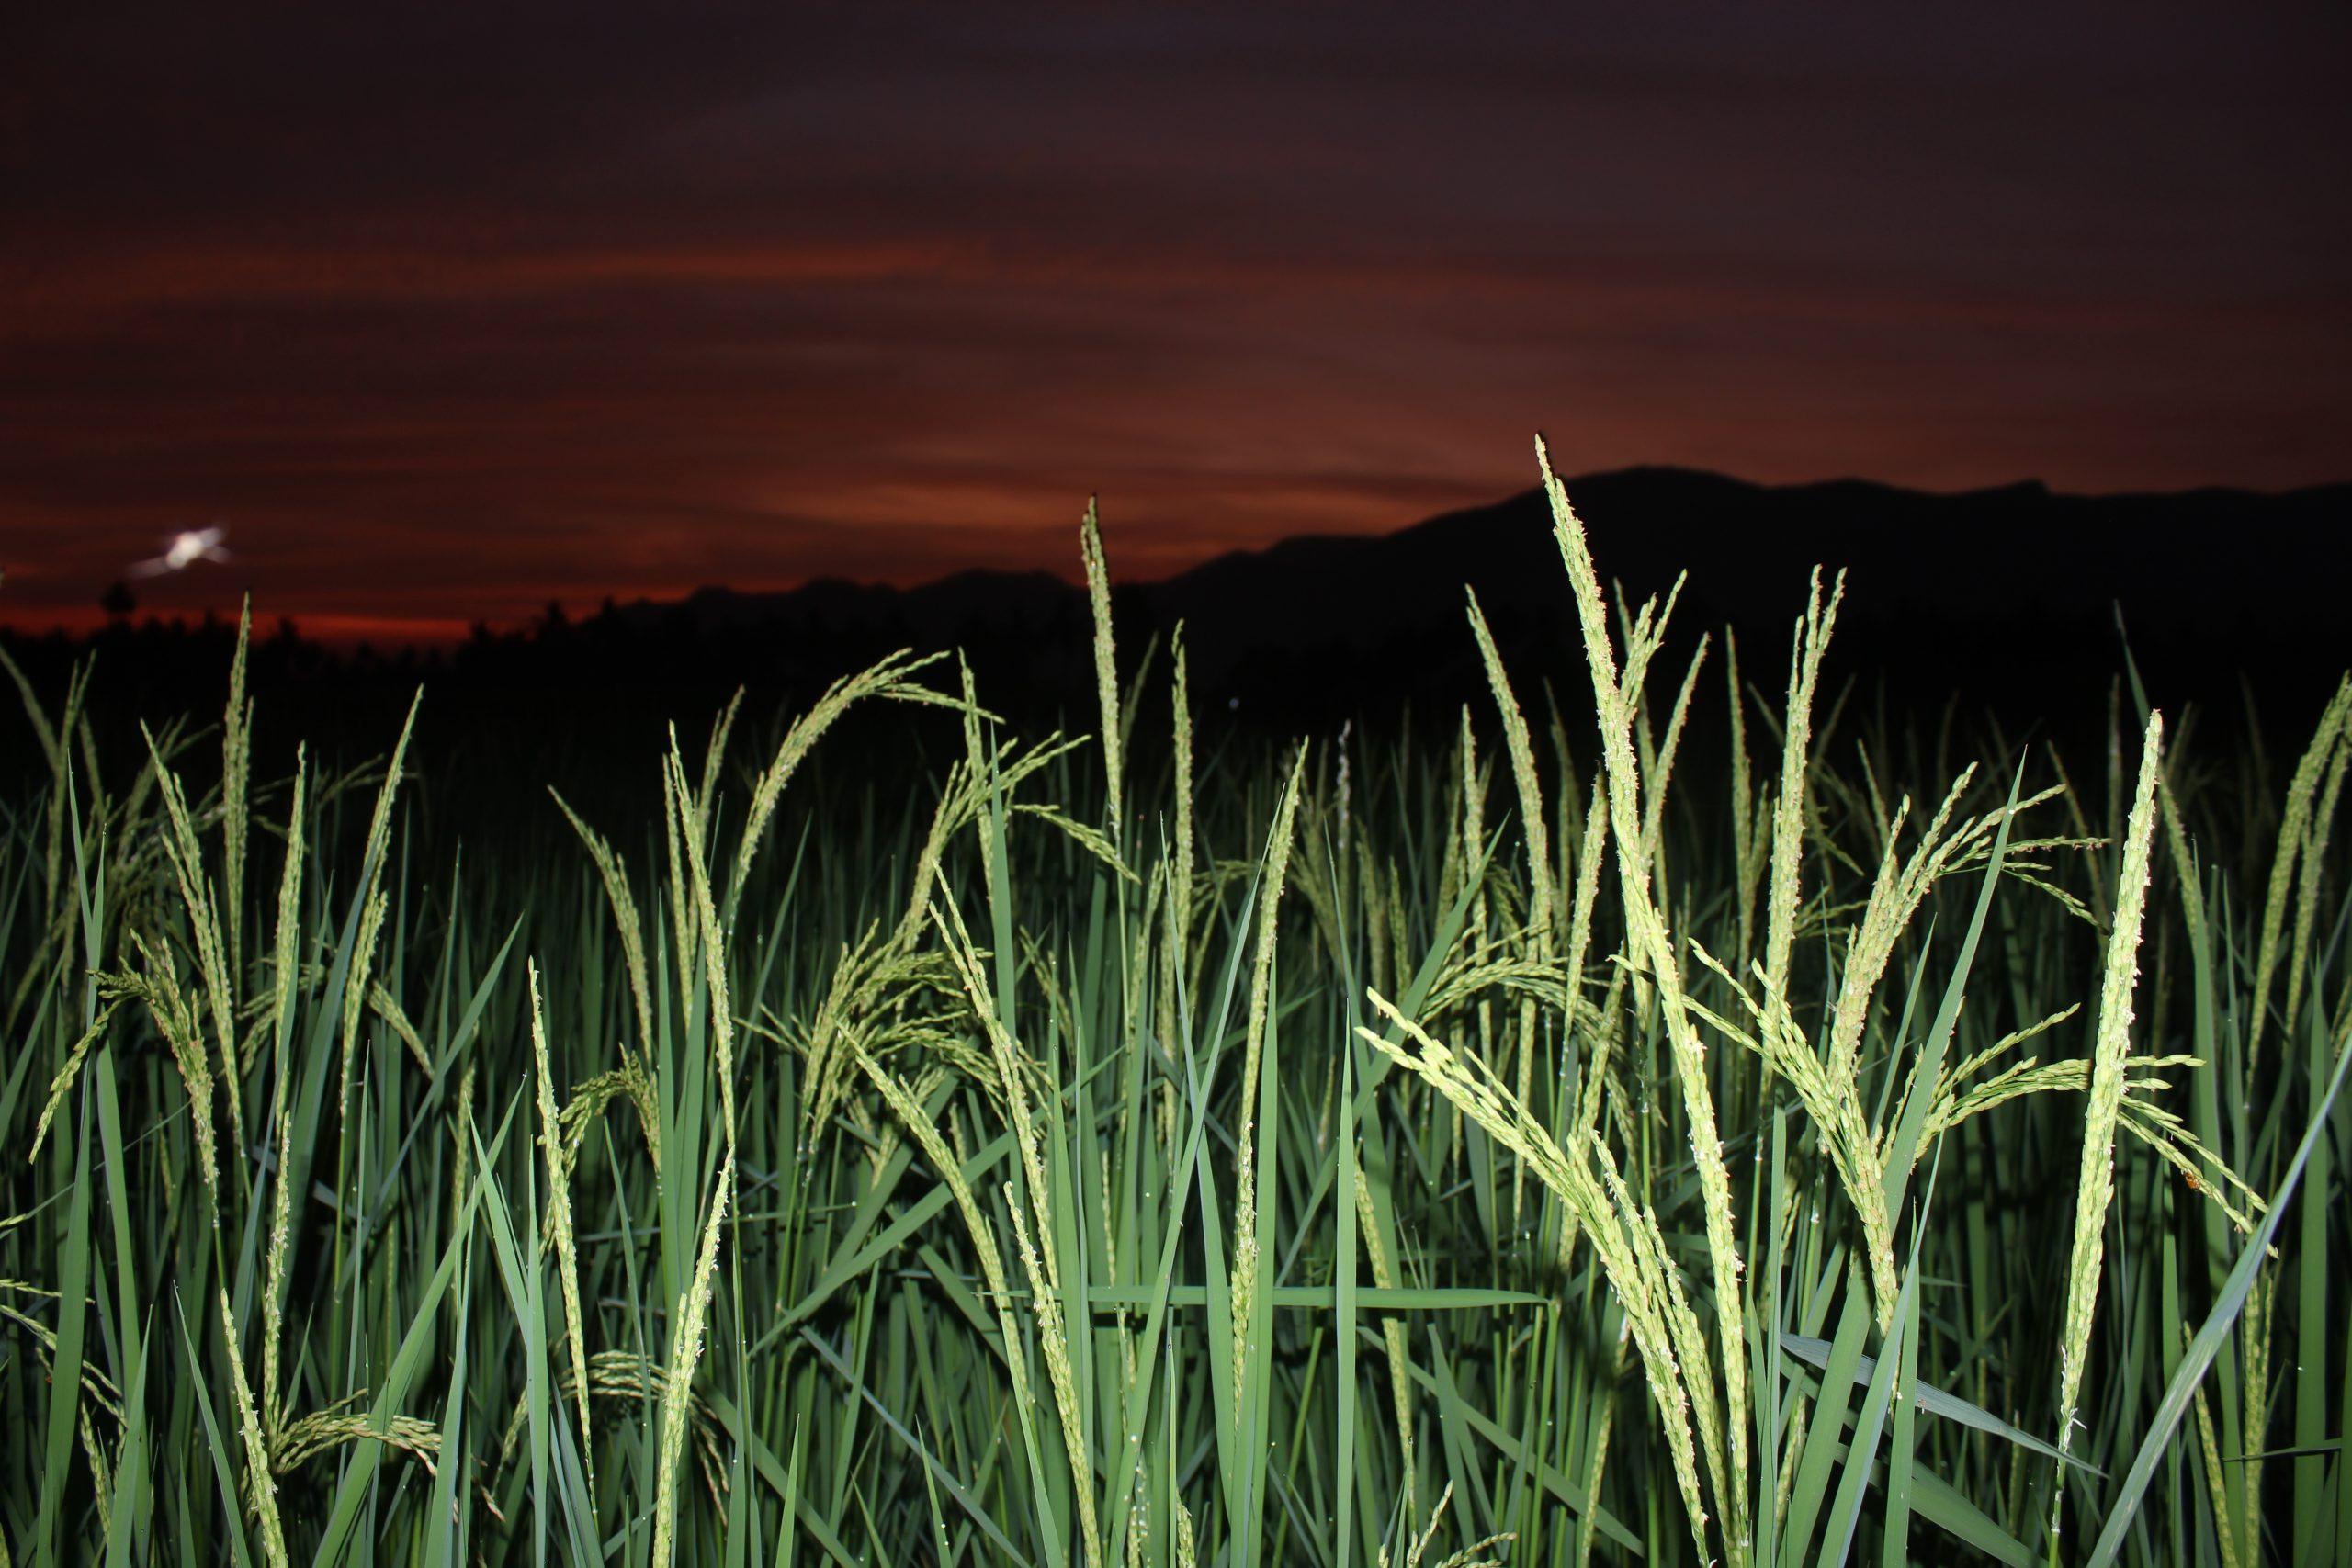 Paddy Field at night